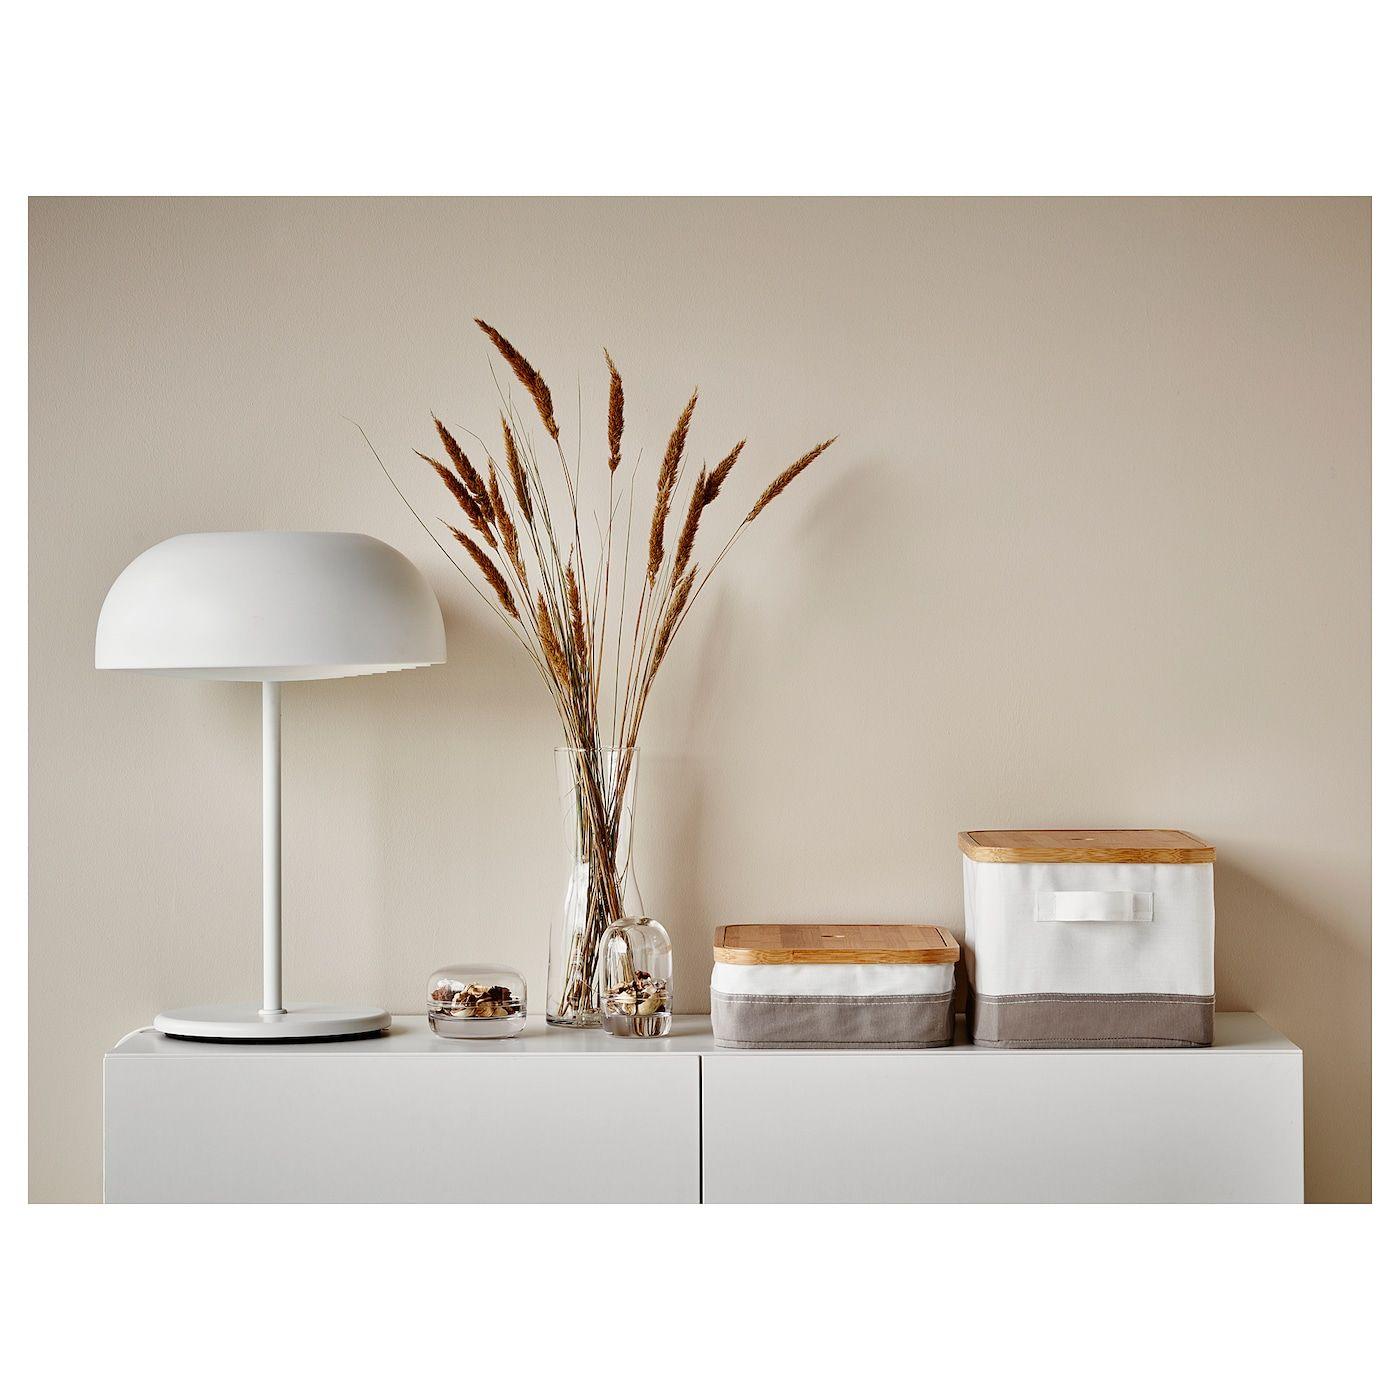 Nymane Tafellamp Wit Ikea In 2020 White Table Lamp Table Lamp Ikea